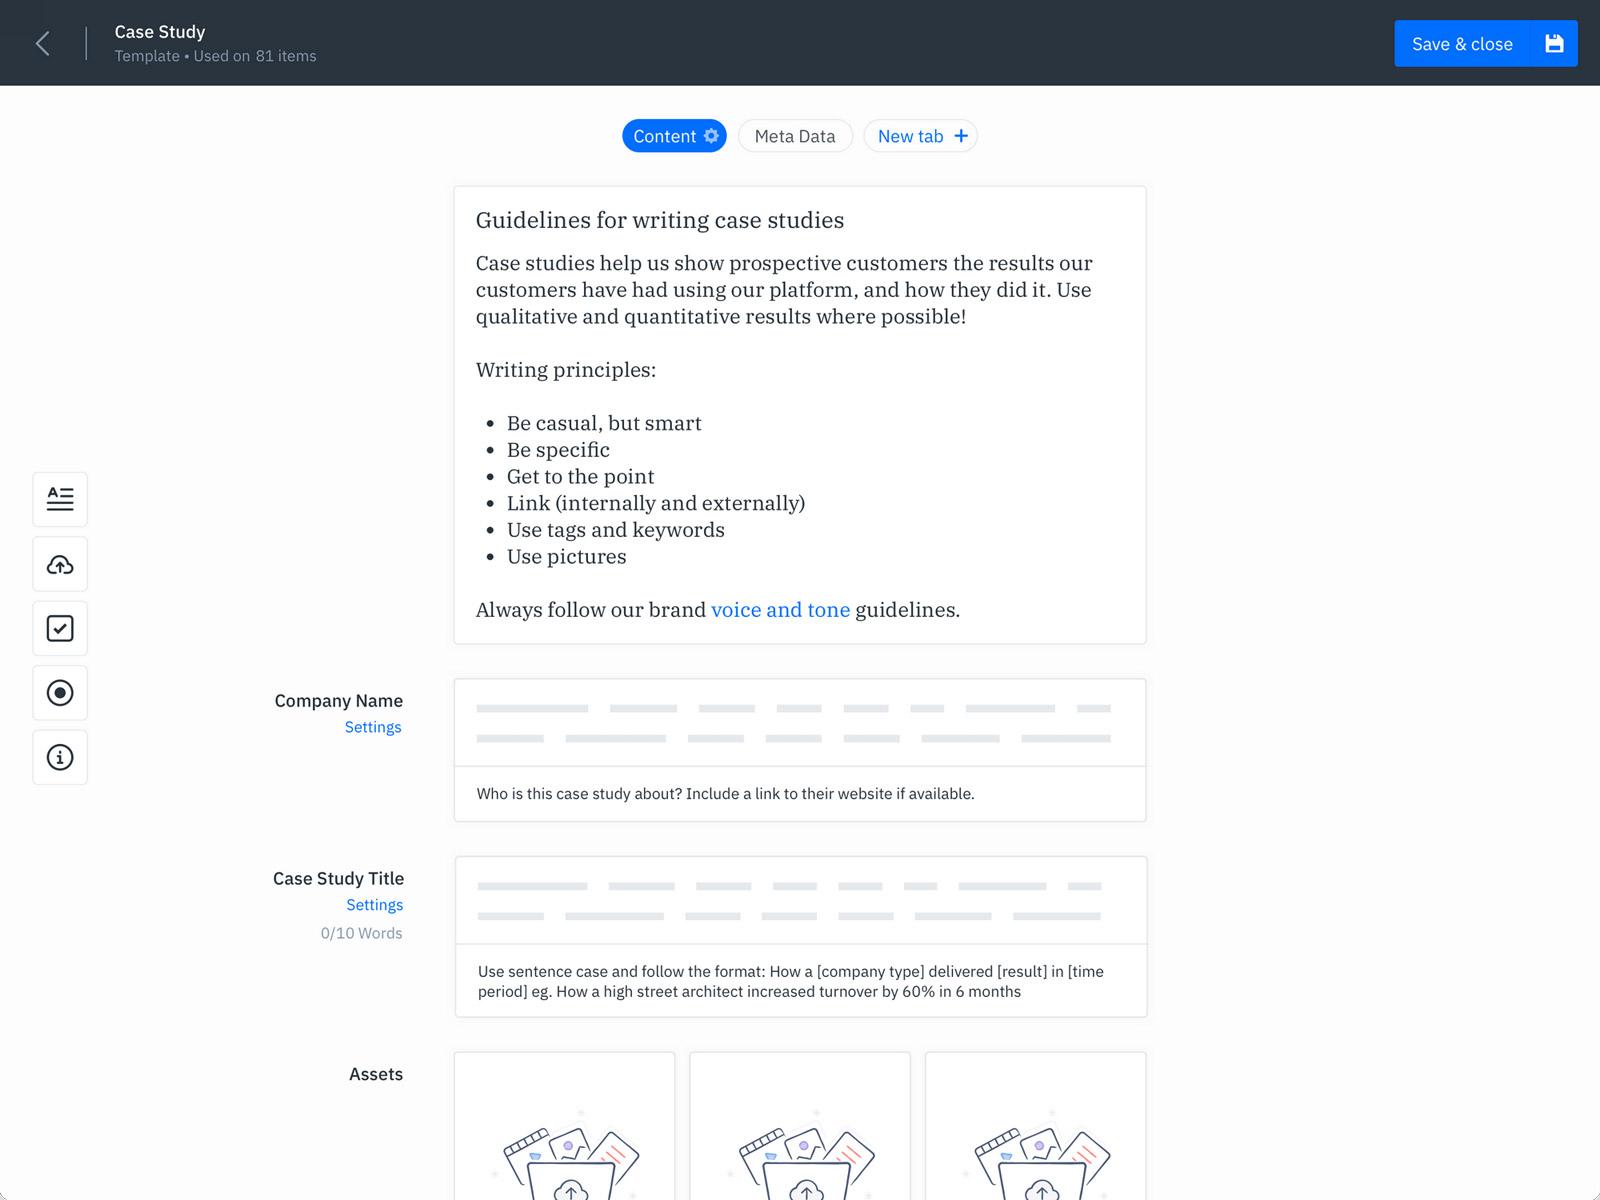 GatherContent Content Template Builder UI - Website Content